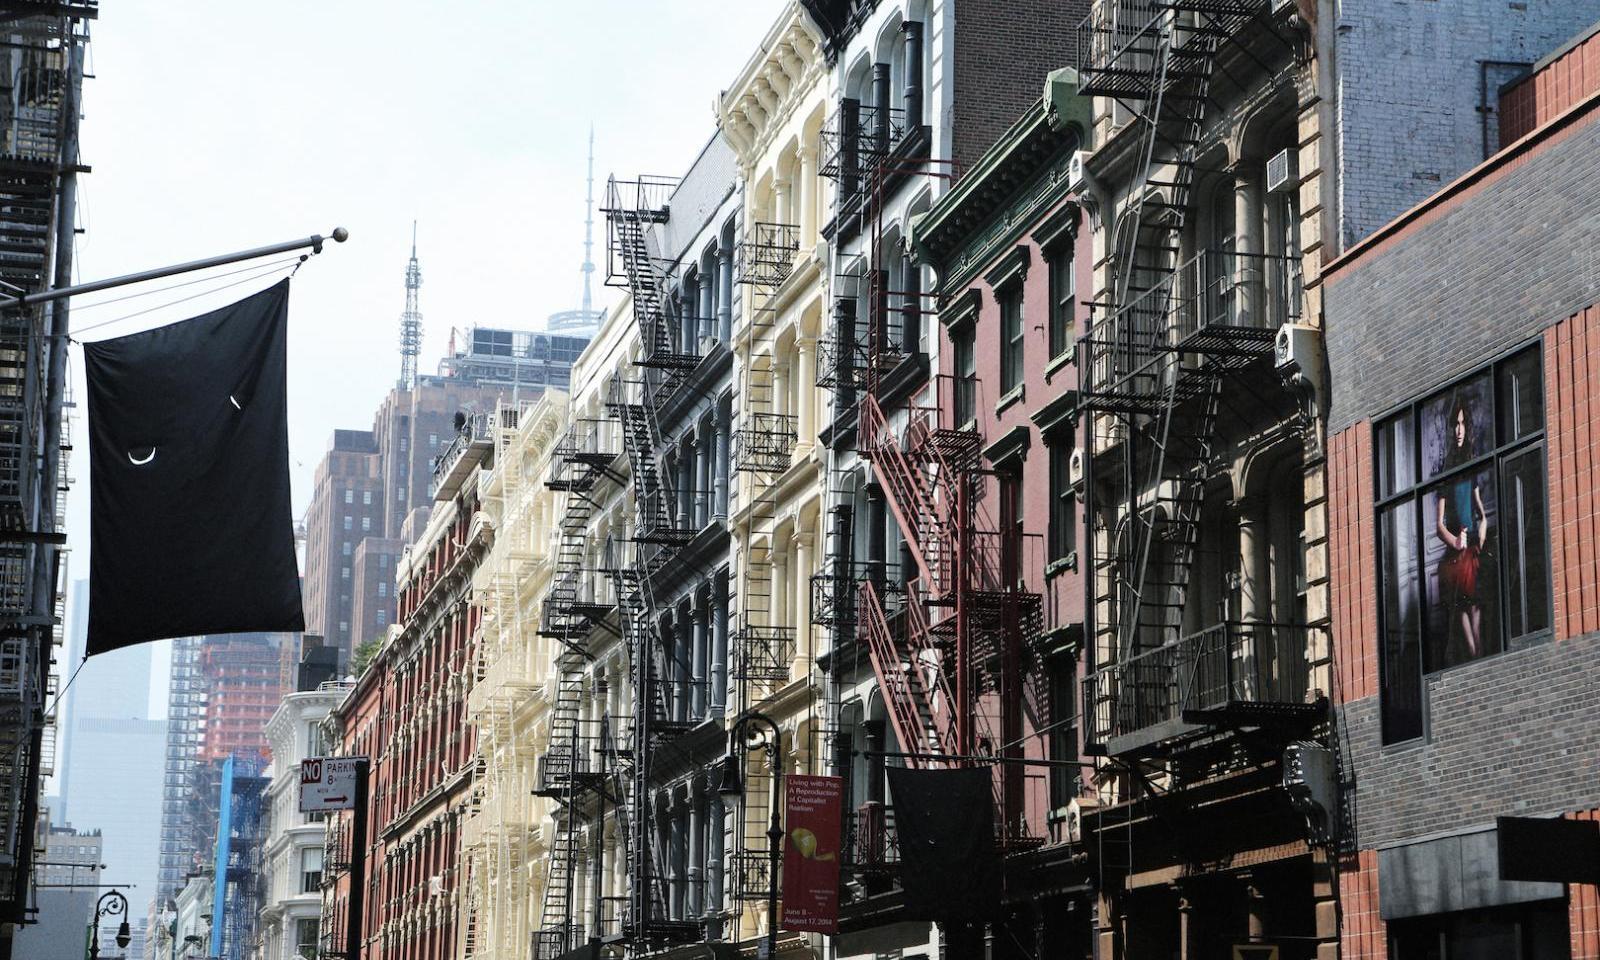 Zara Soho New York >> SoHo New York: Ein Textilviertel wird zum reichen Szeneviertel